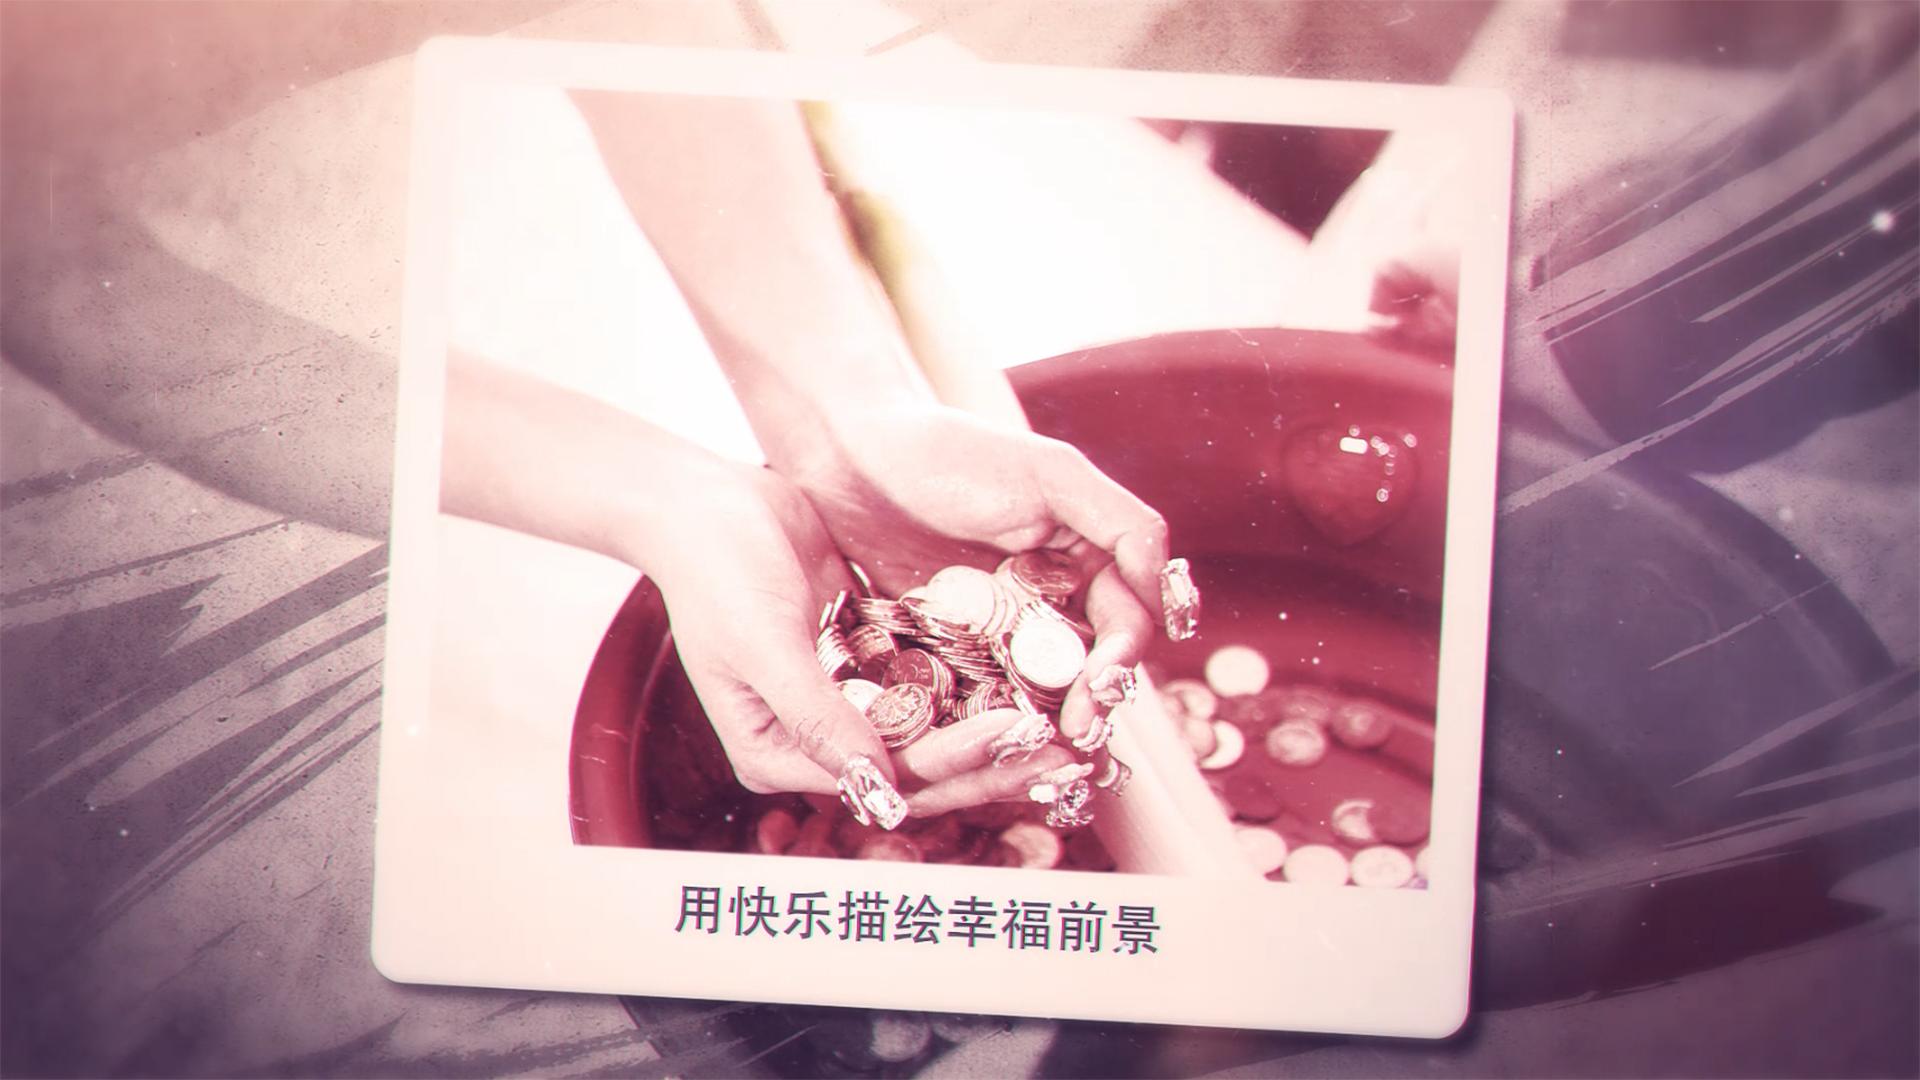 浪漫爱情婚礼相册AE模板